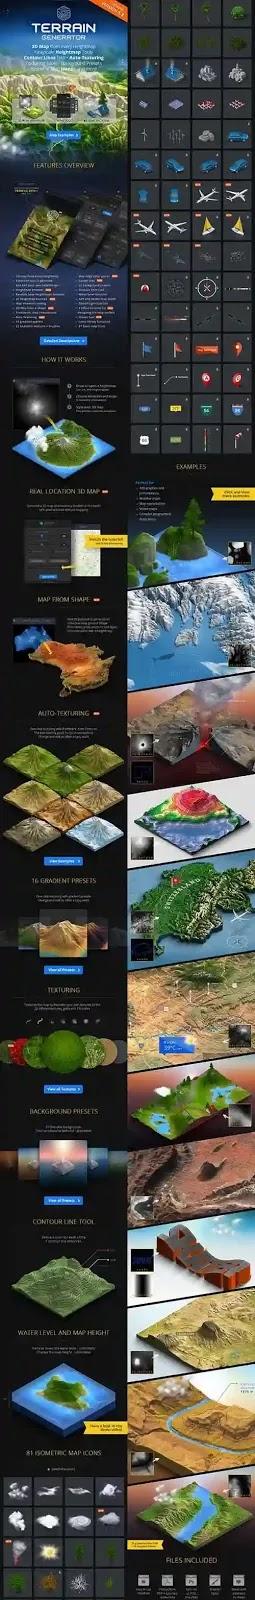 3D Map Generator Terrain From Heightmap